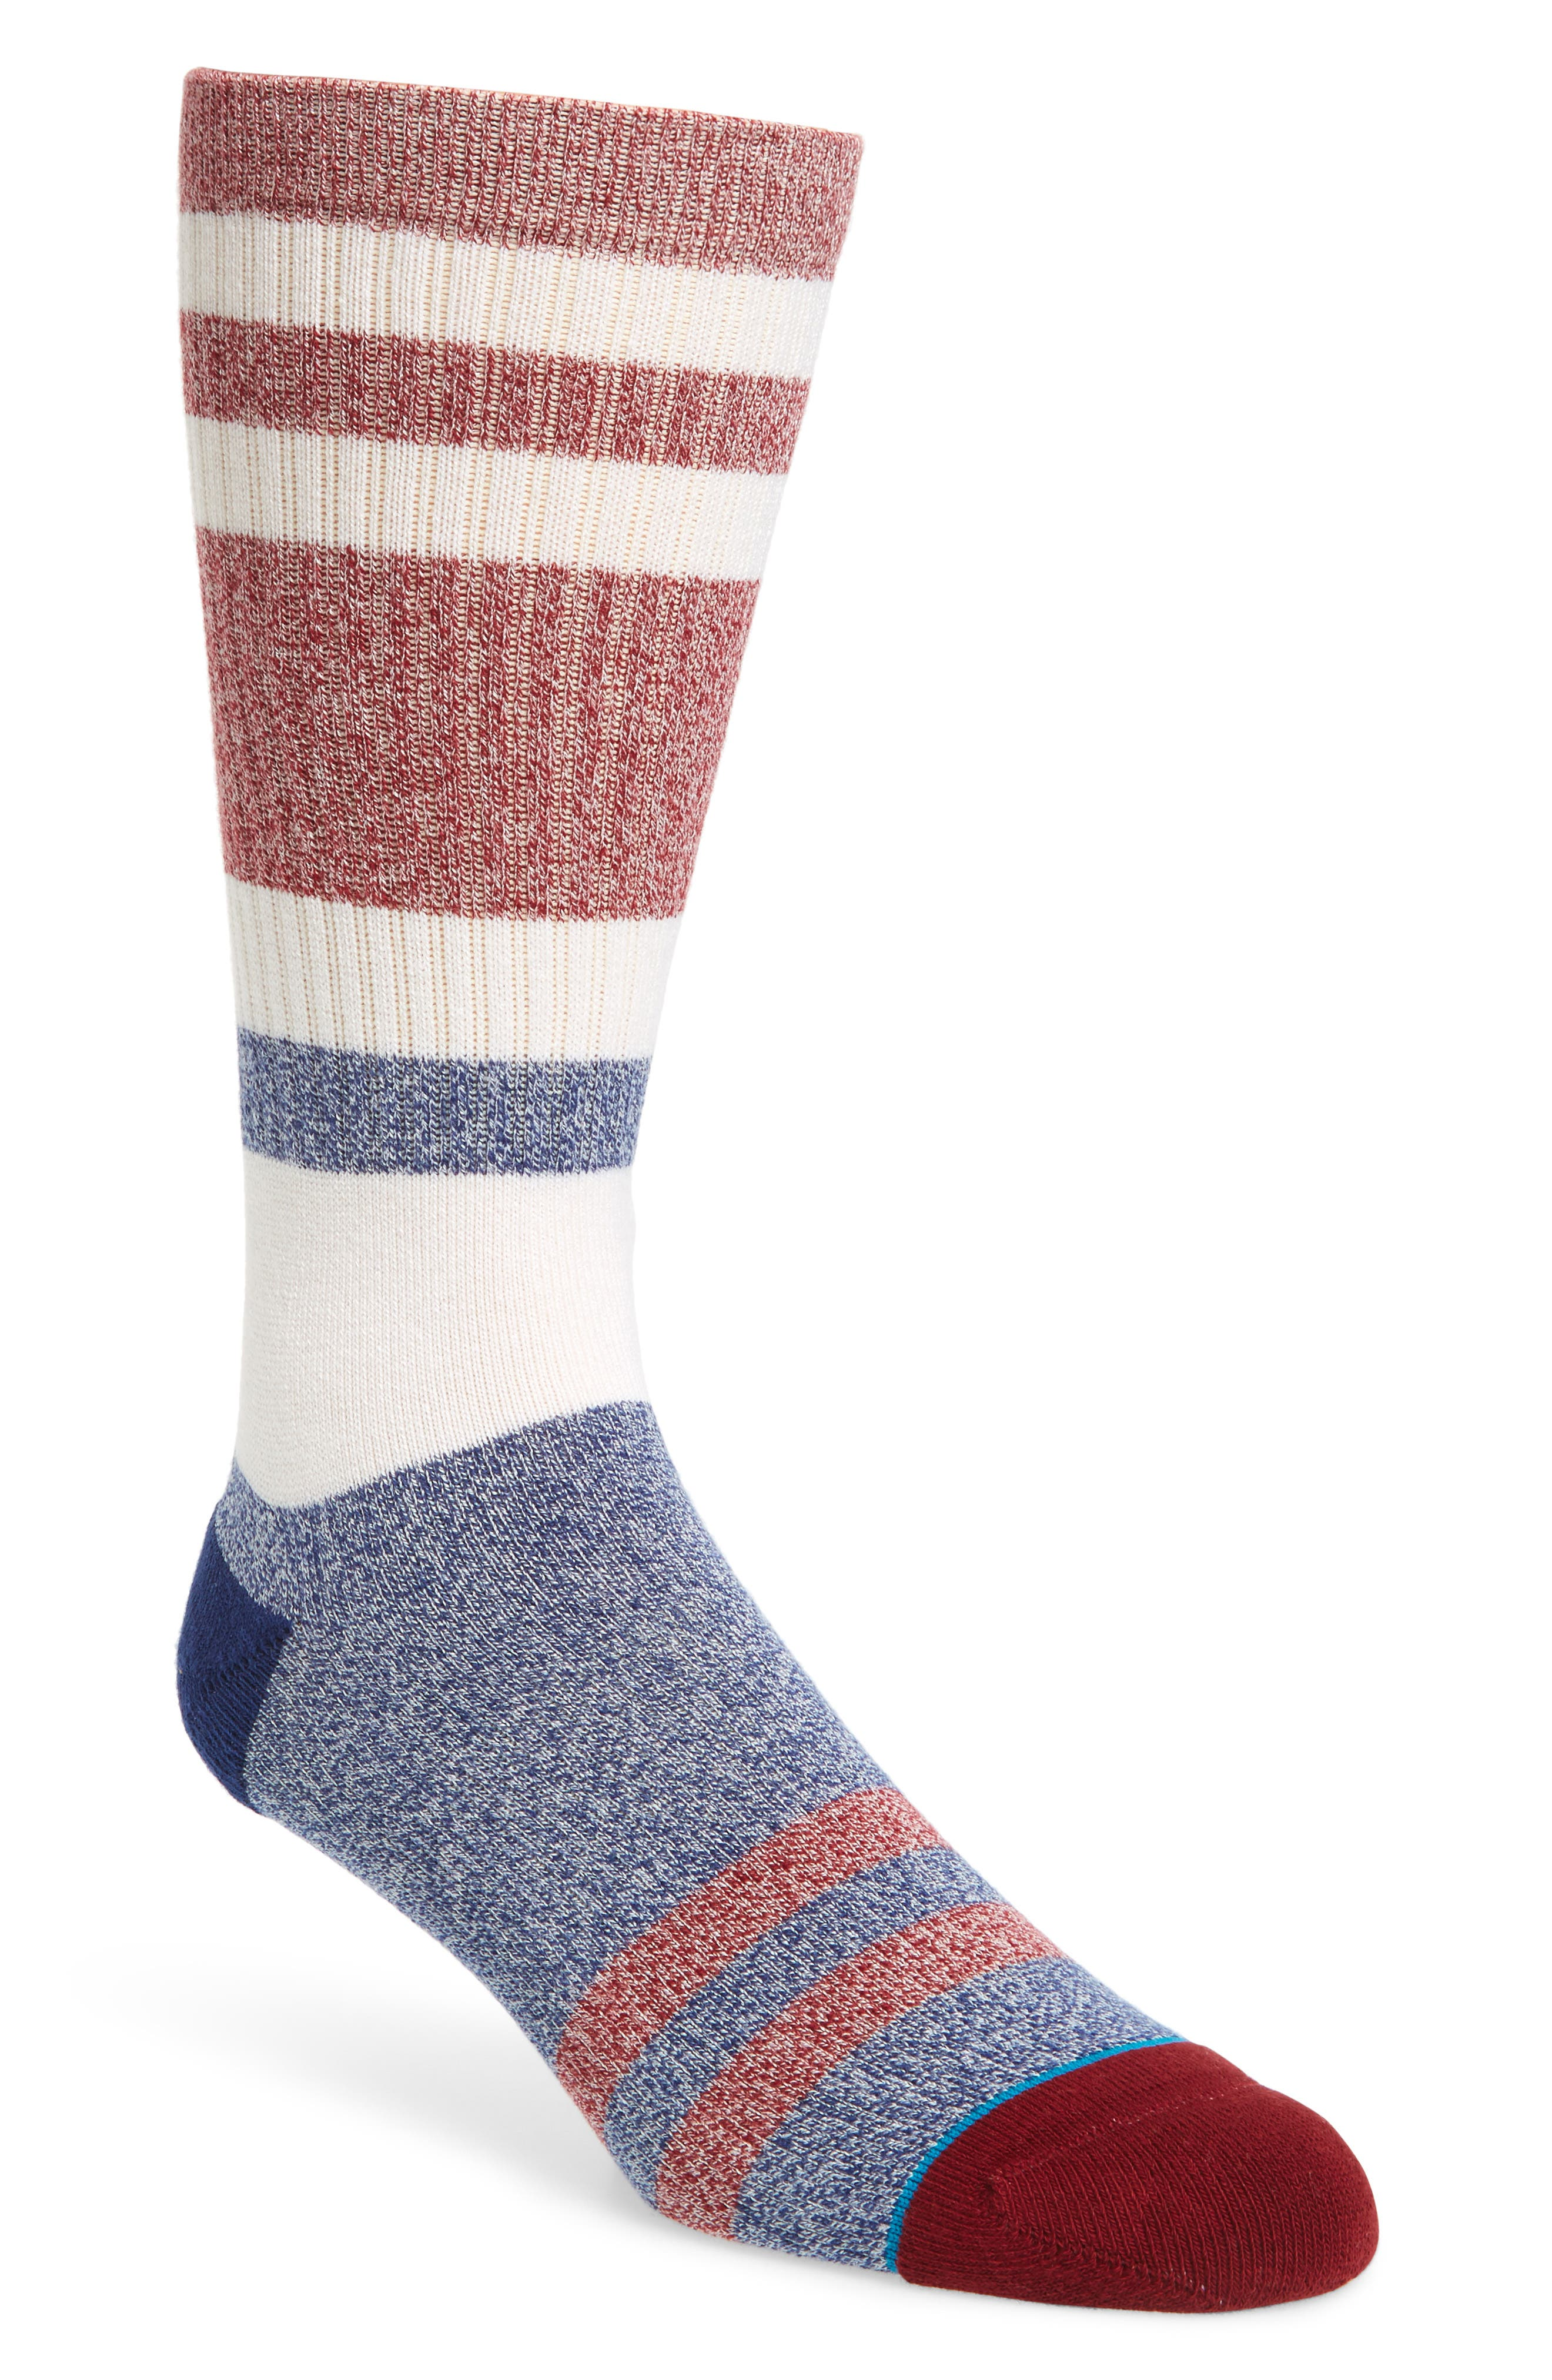 Robinsen Crew Socks,                         Main,                         color, Red